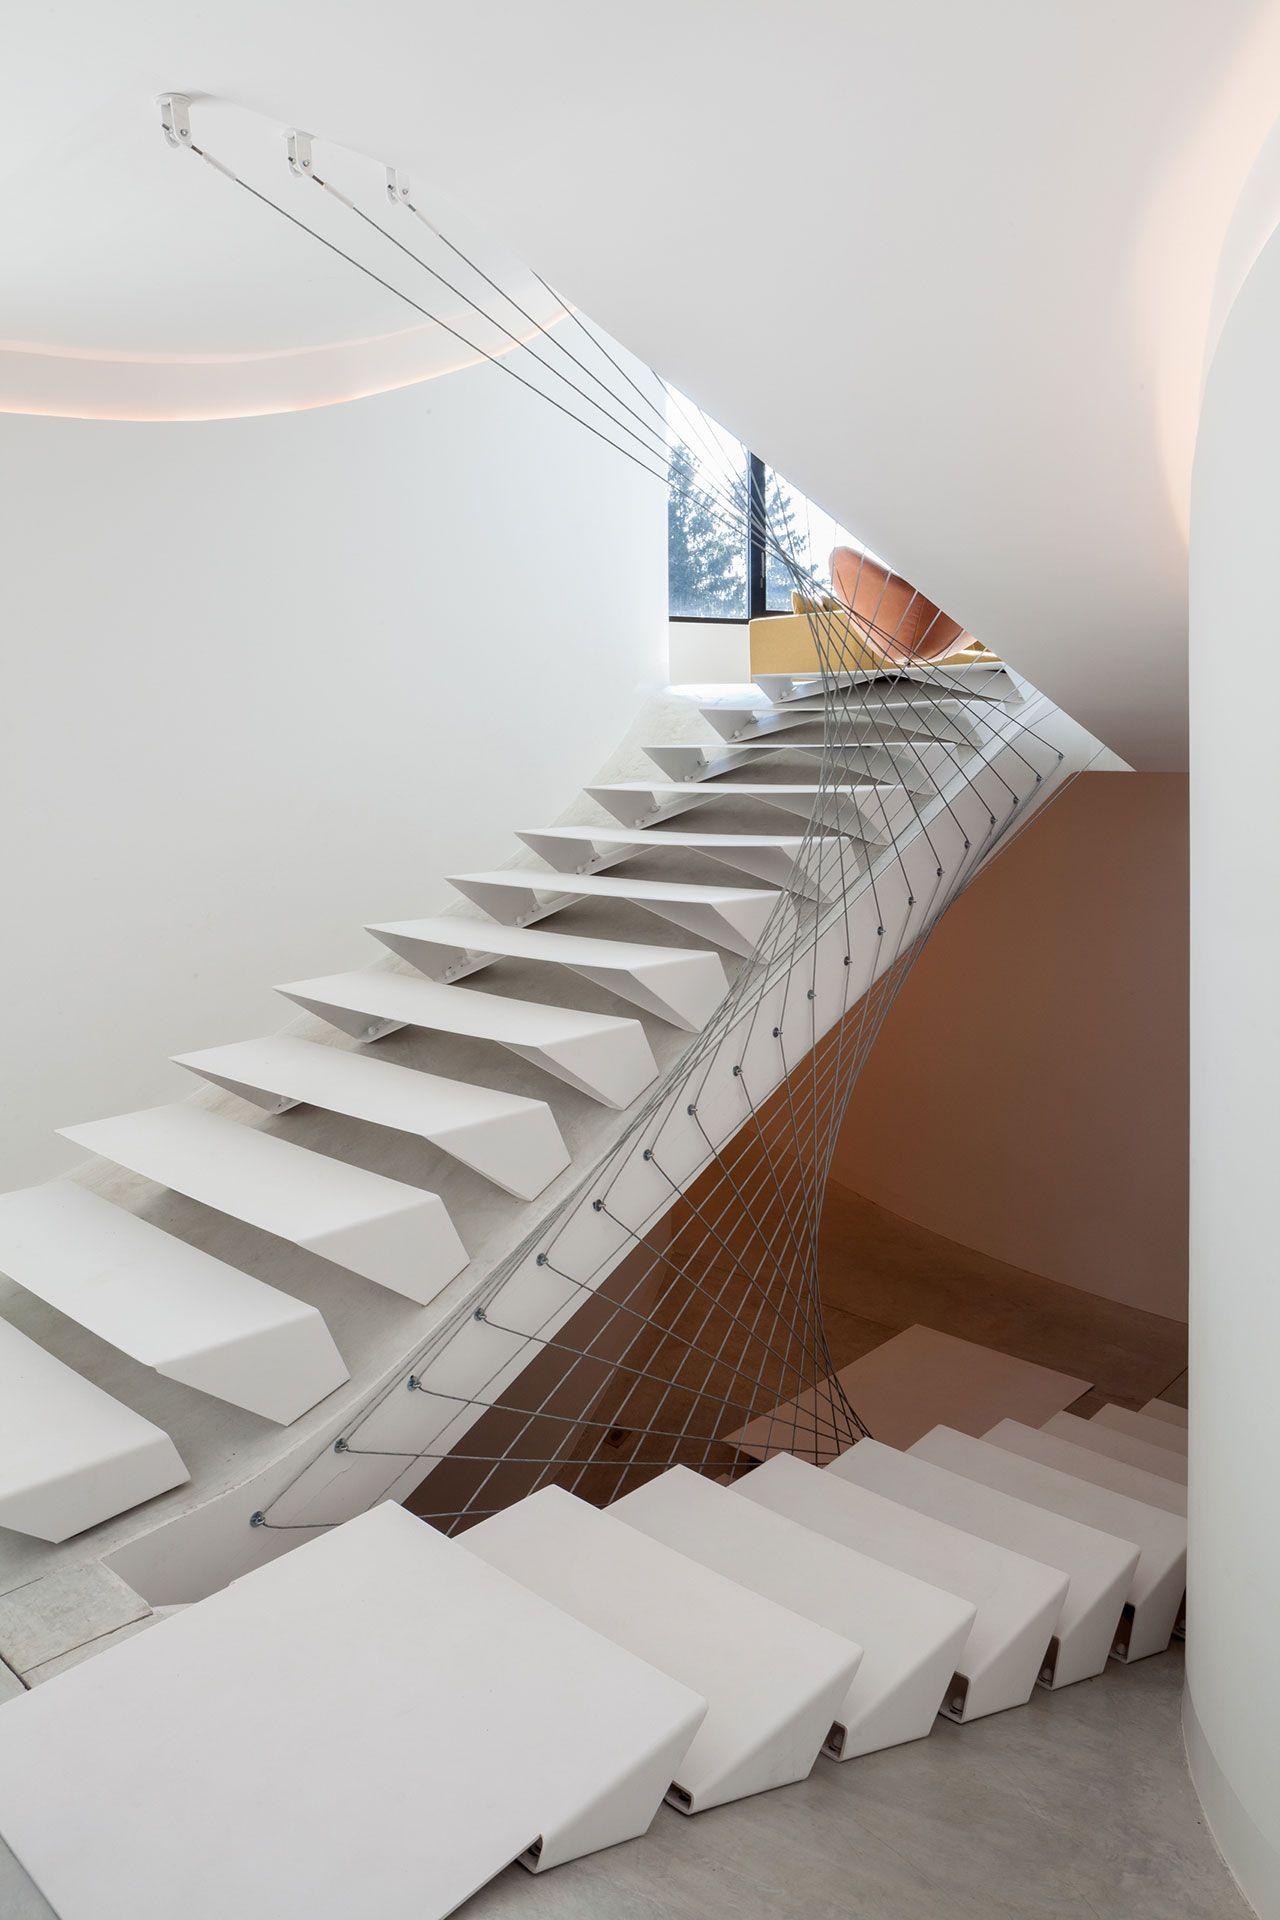 Villa MQ in Tremelo, Belgium by Office O Architects   Yatzer